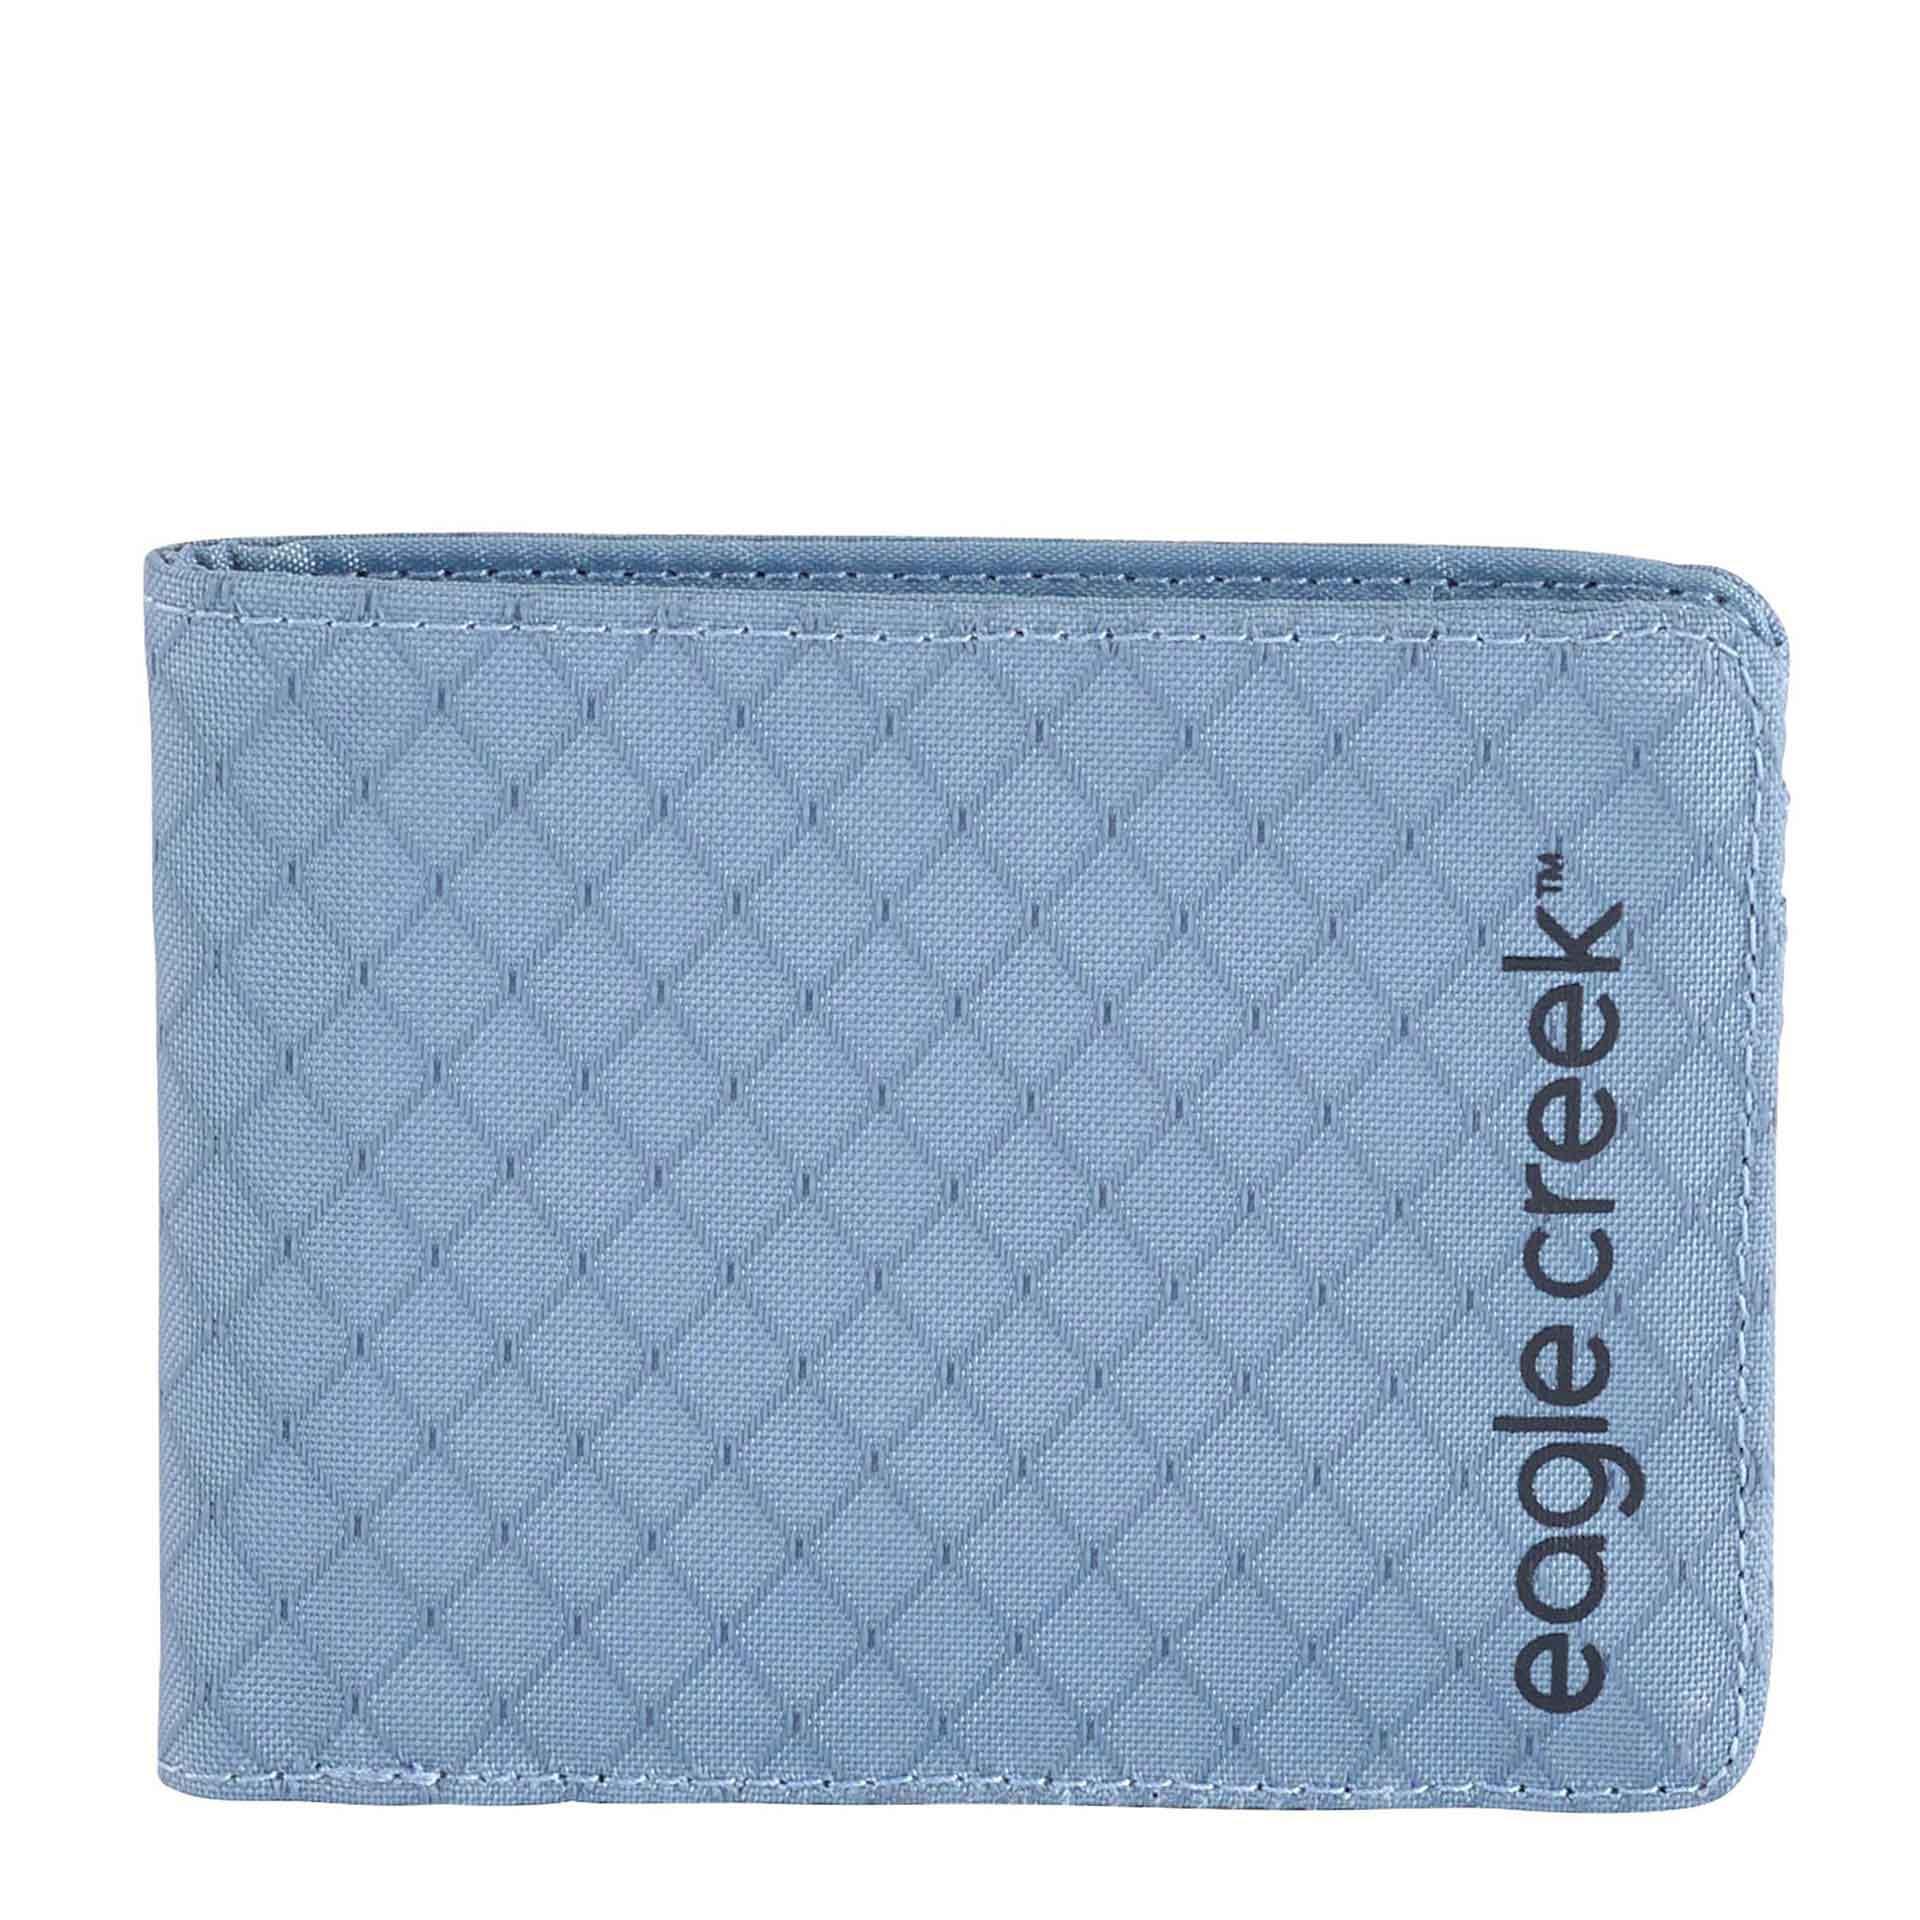 Eagle Creek RFID Bi-Fold Geldbörse arctic blue